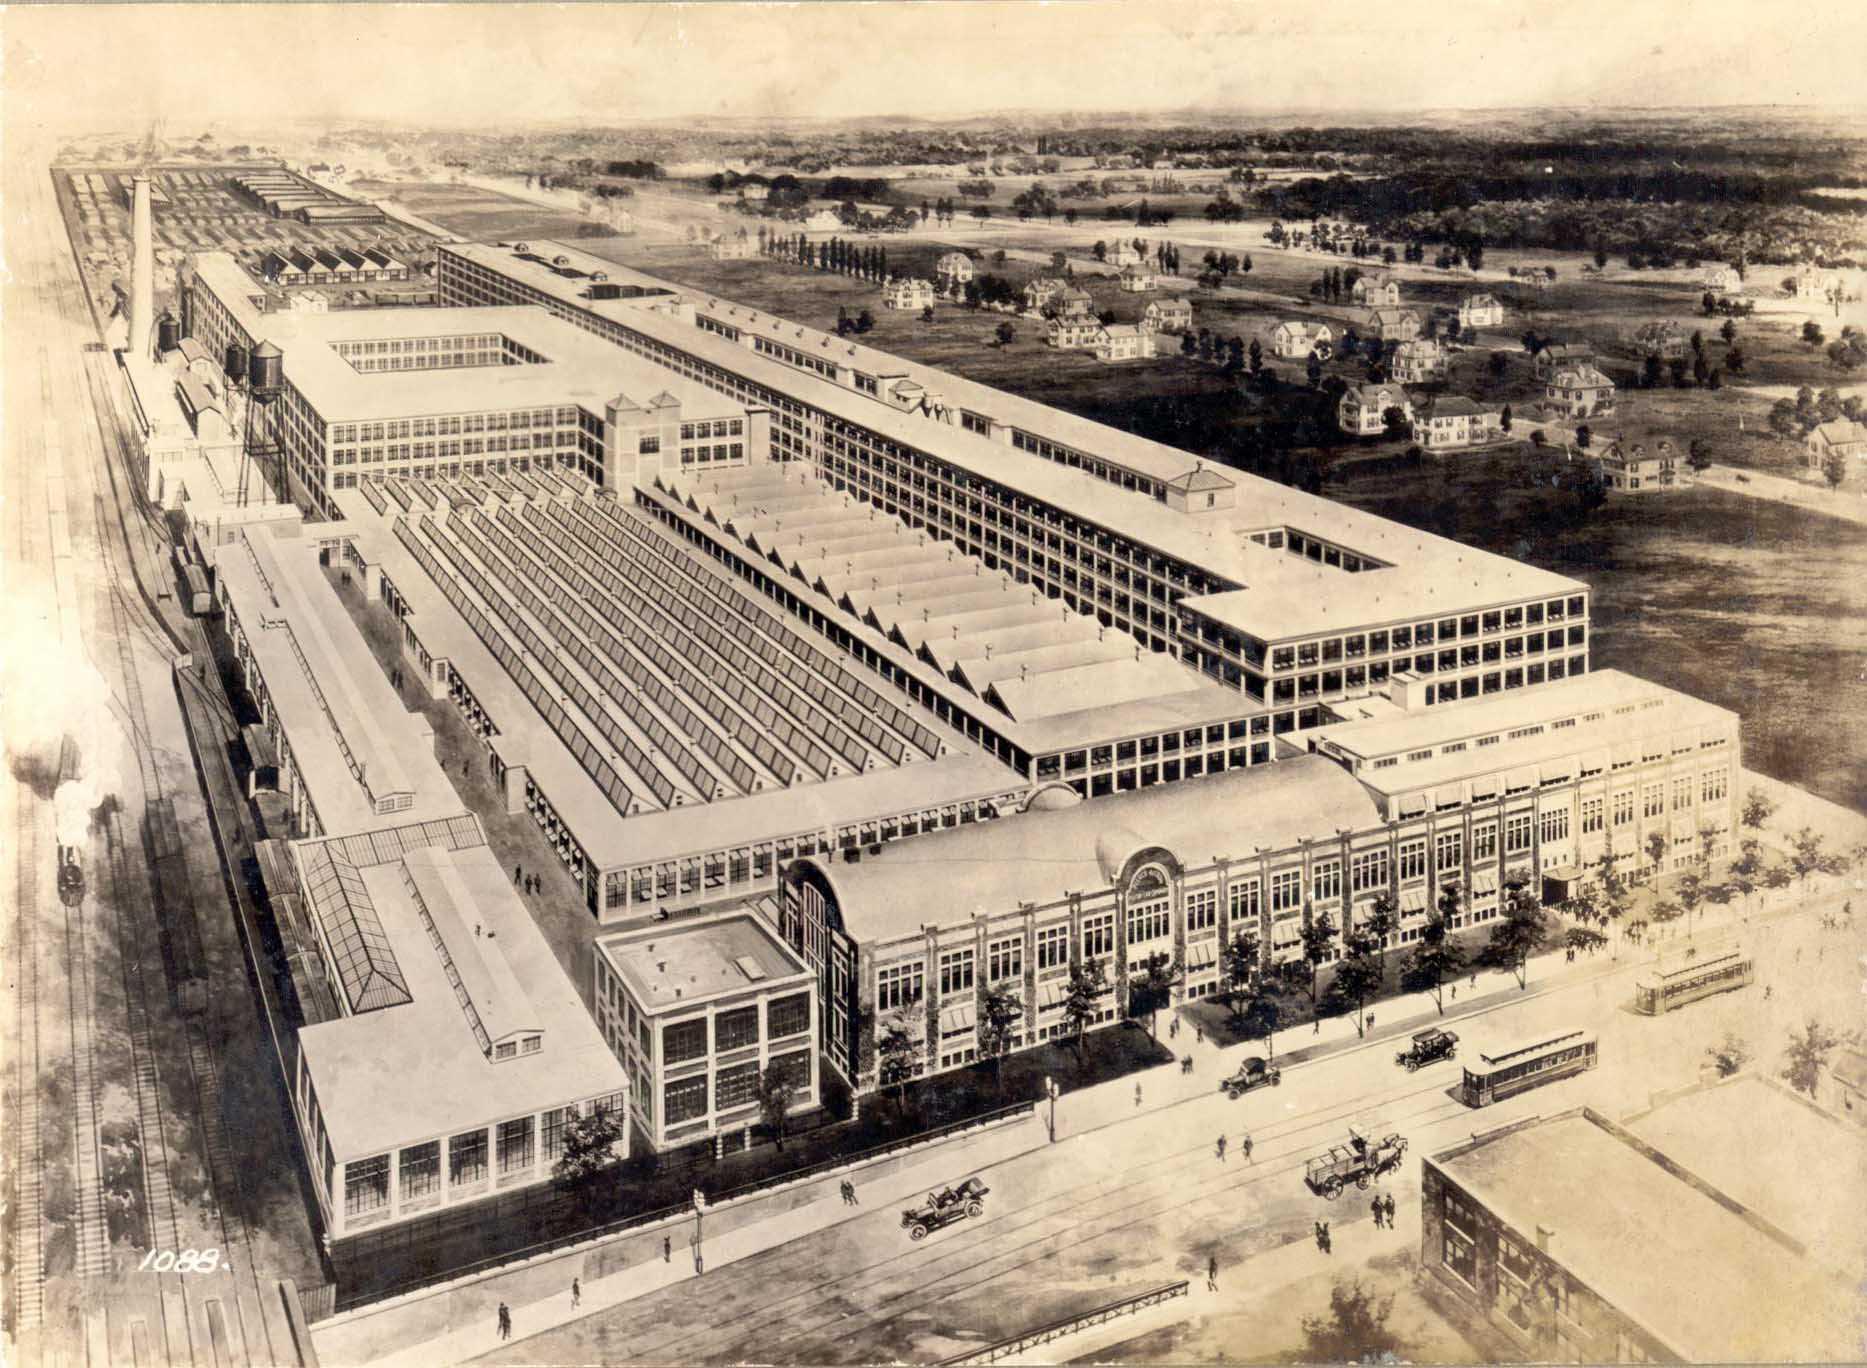 Pierce-Arrow Motor Car Co., Elmwood & Great Arrow, Buffalo